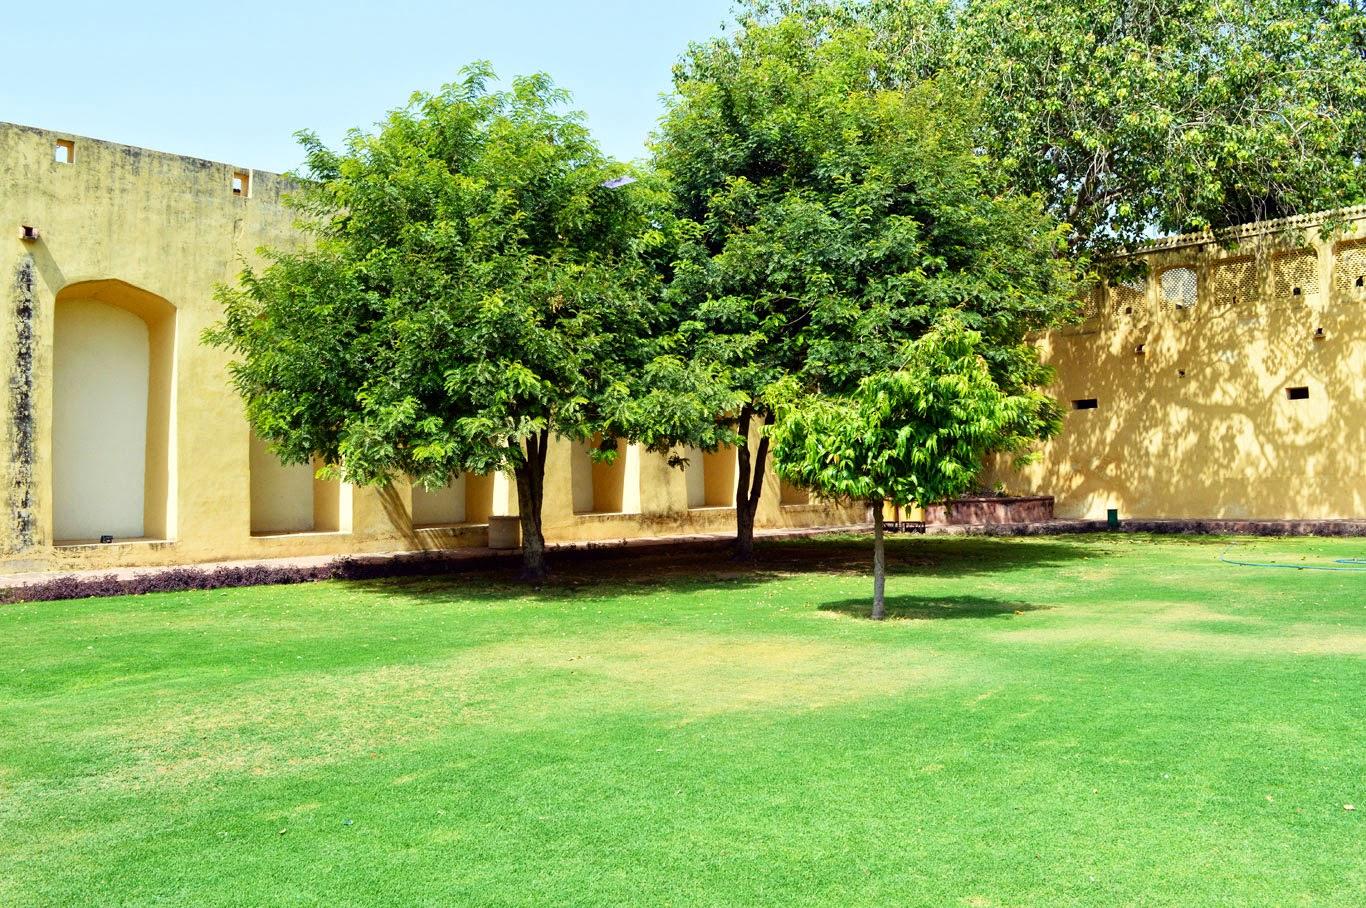 Sanjay Photo World Garden Backgrounds For Photoshop